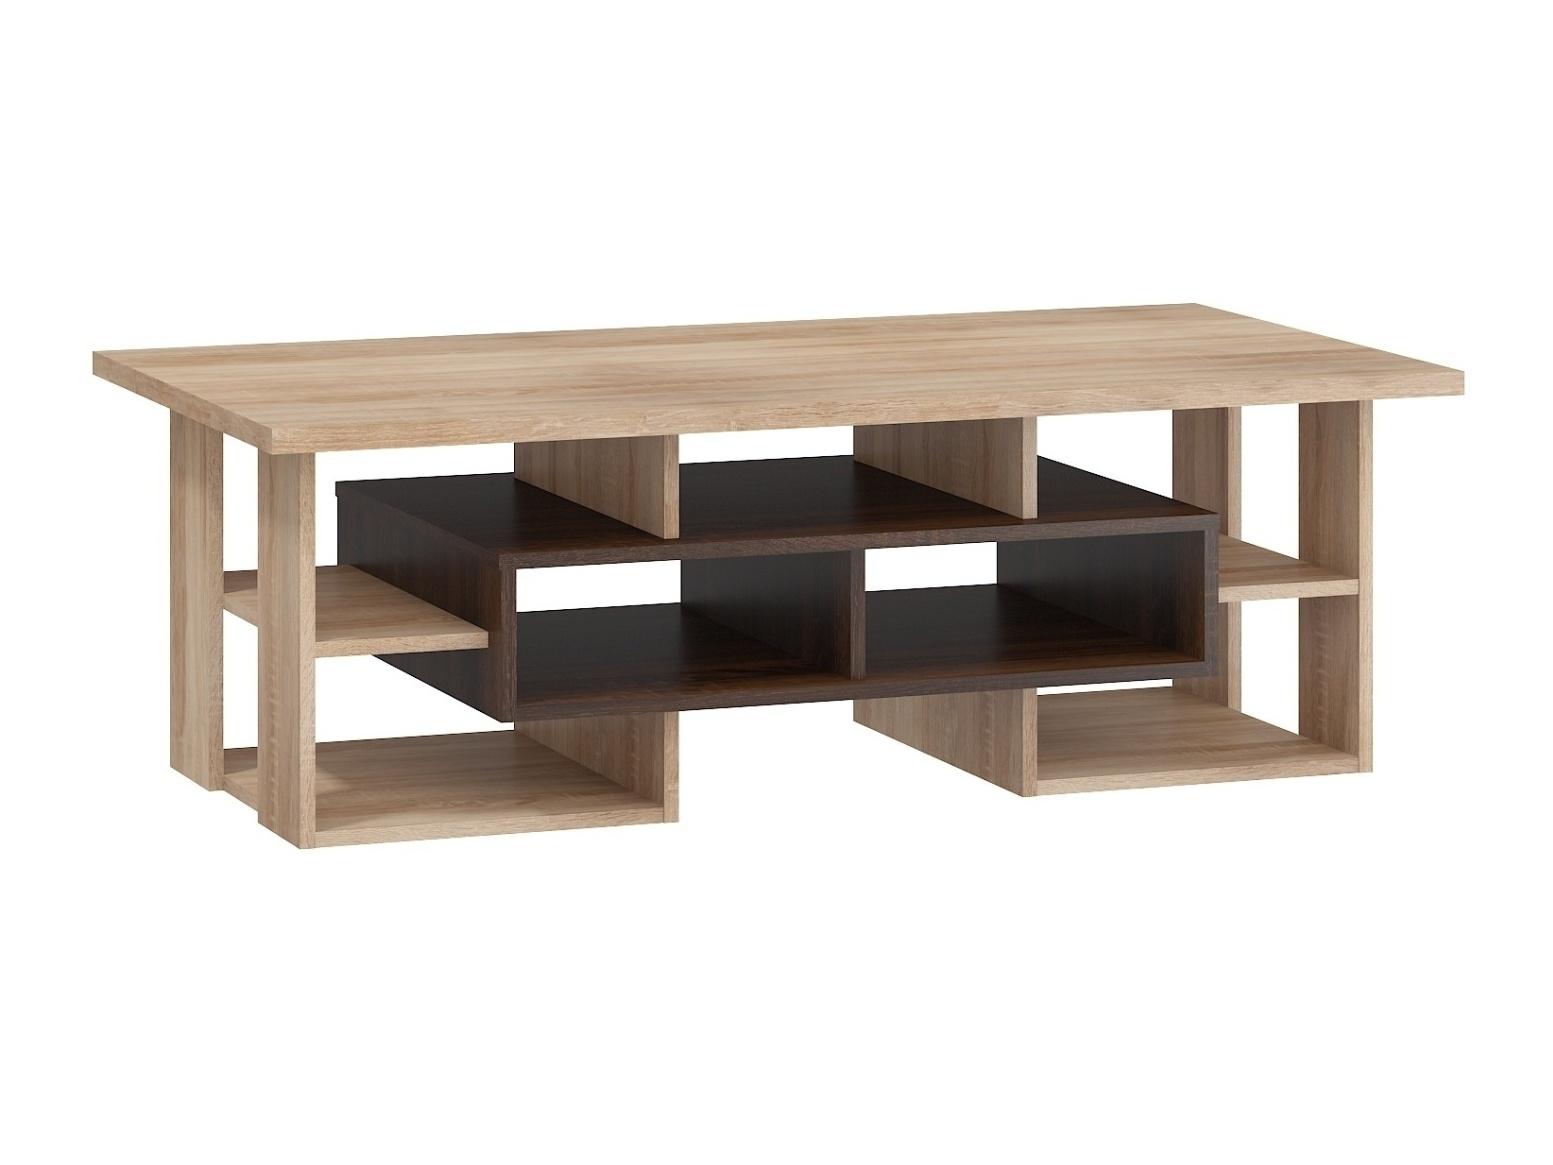 Konferenční stolek DORINDA typ 1, dub sonoma tmavý/dub sonoma, 5 let záruka